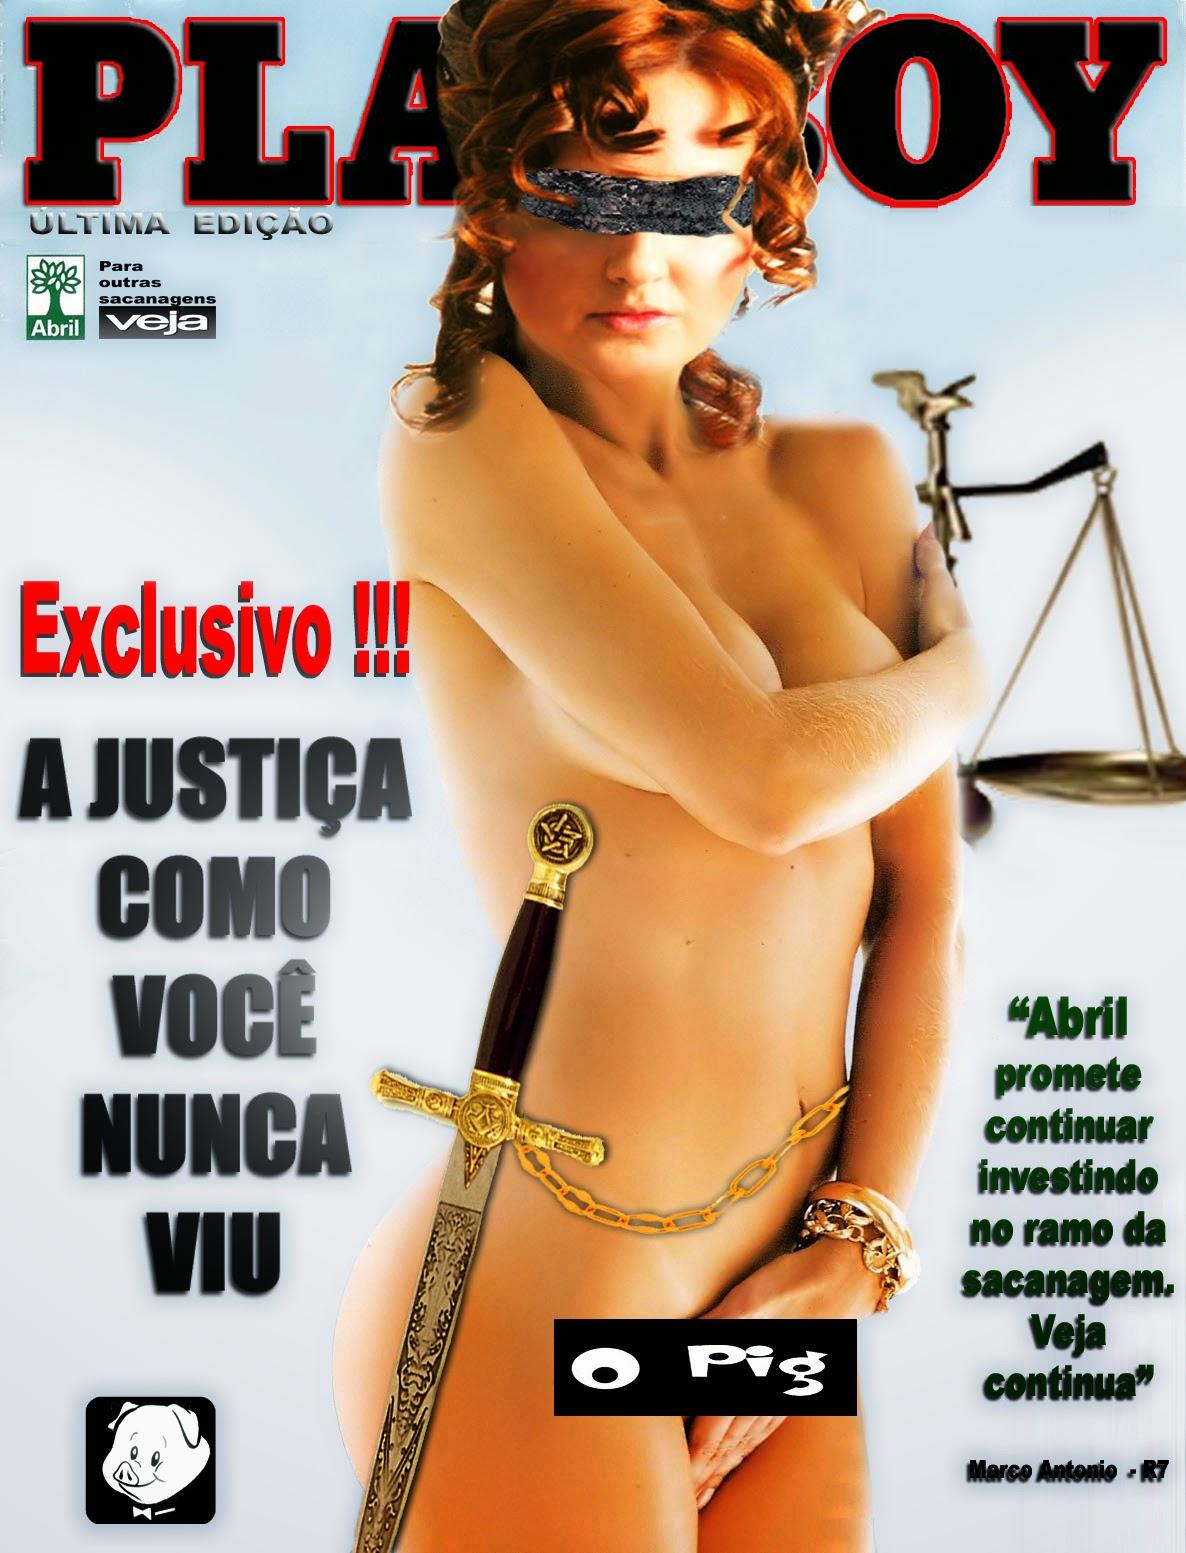 Eclusivo Ltima Capa Da Revista Playboy